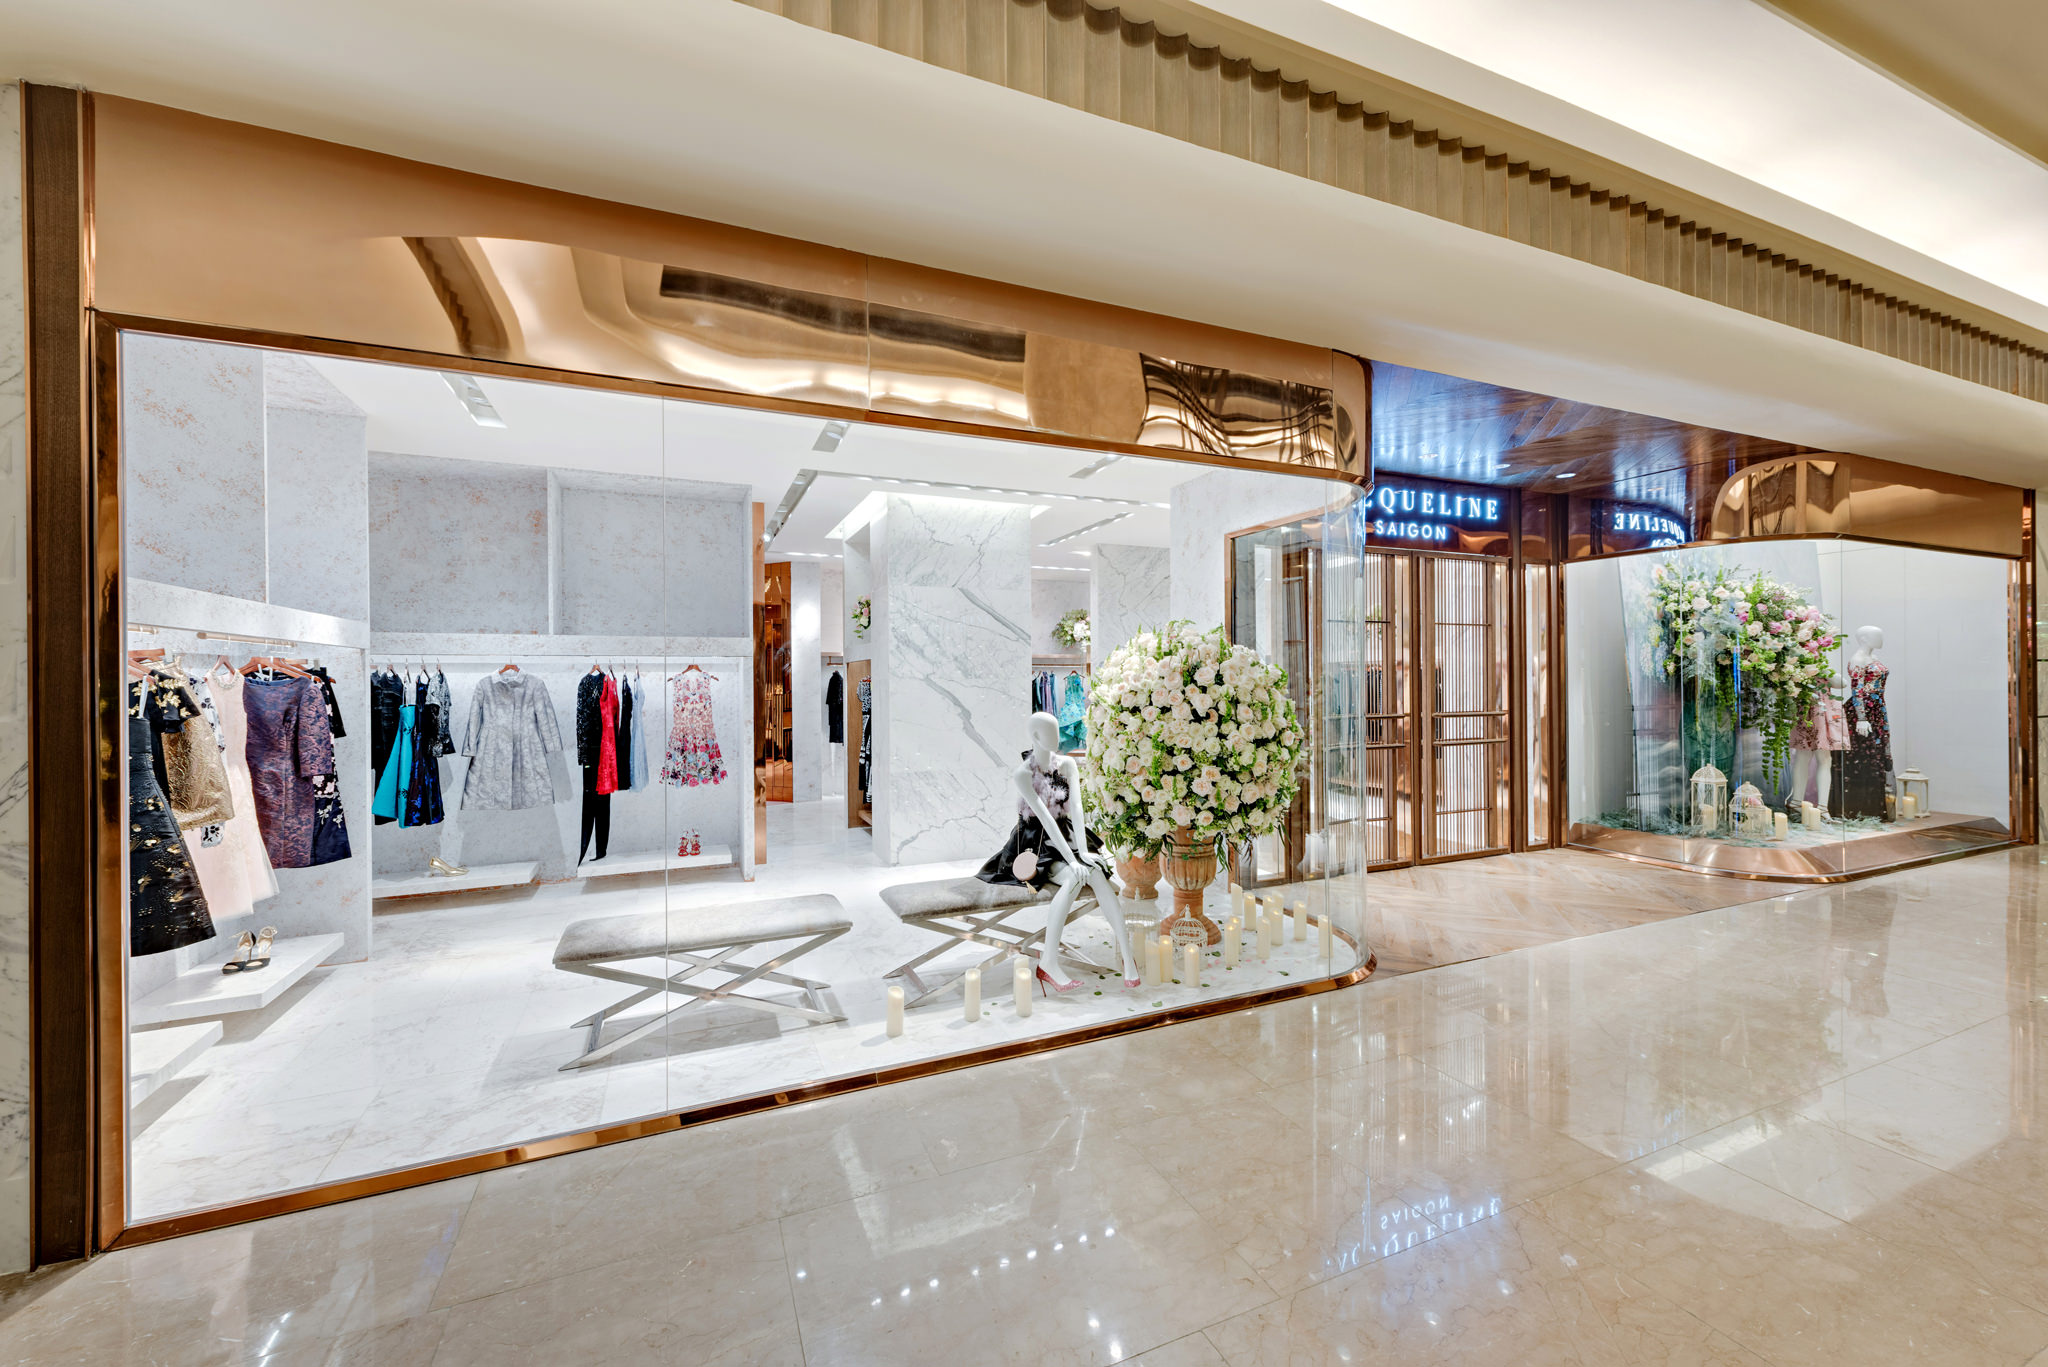 20161224 - Jacqueline - HCM - Commercial - Interior - Store - Retouch 0012.jpg